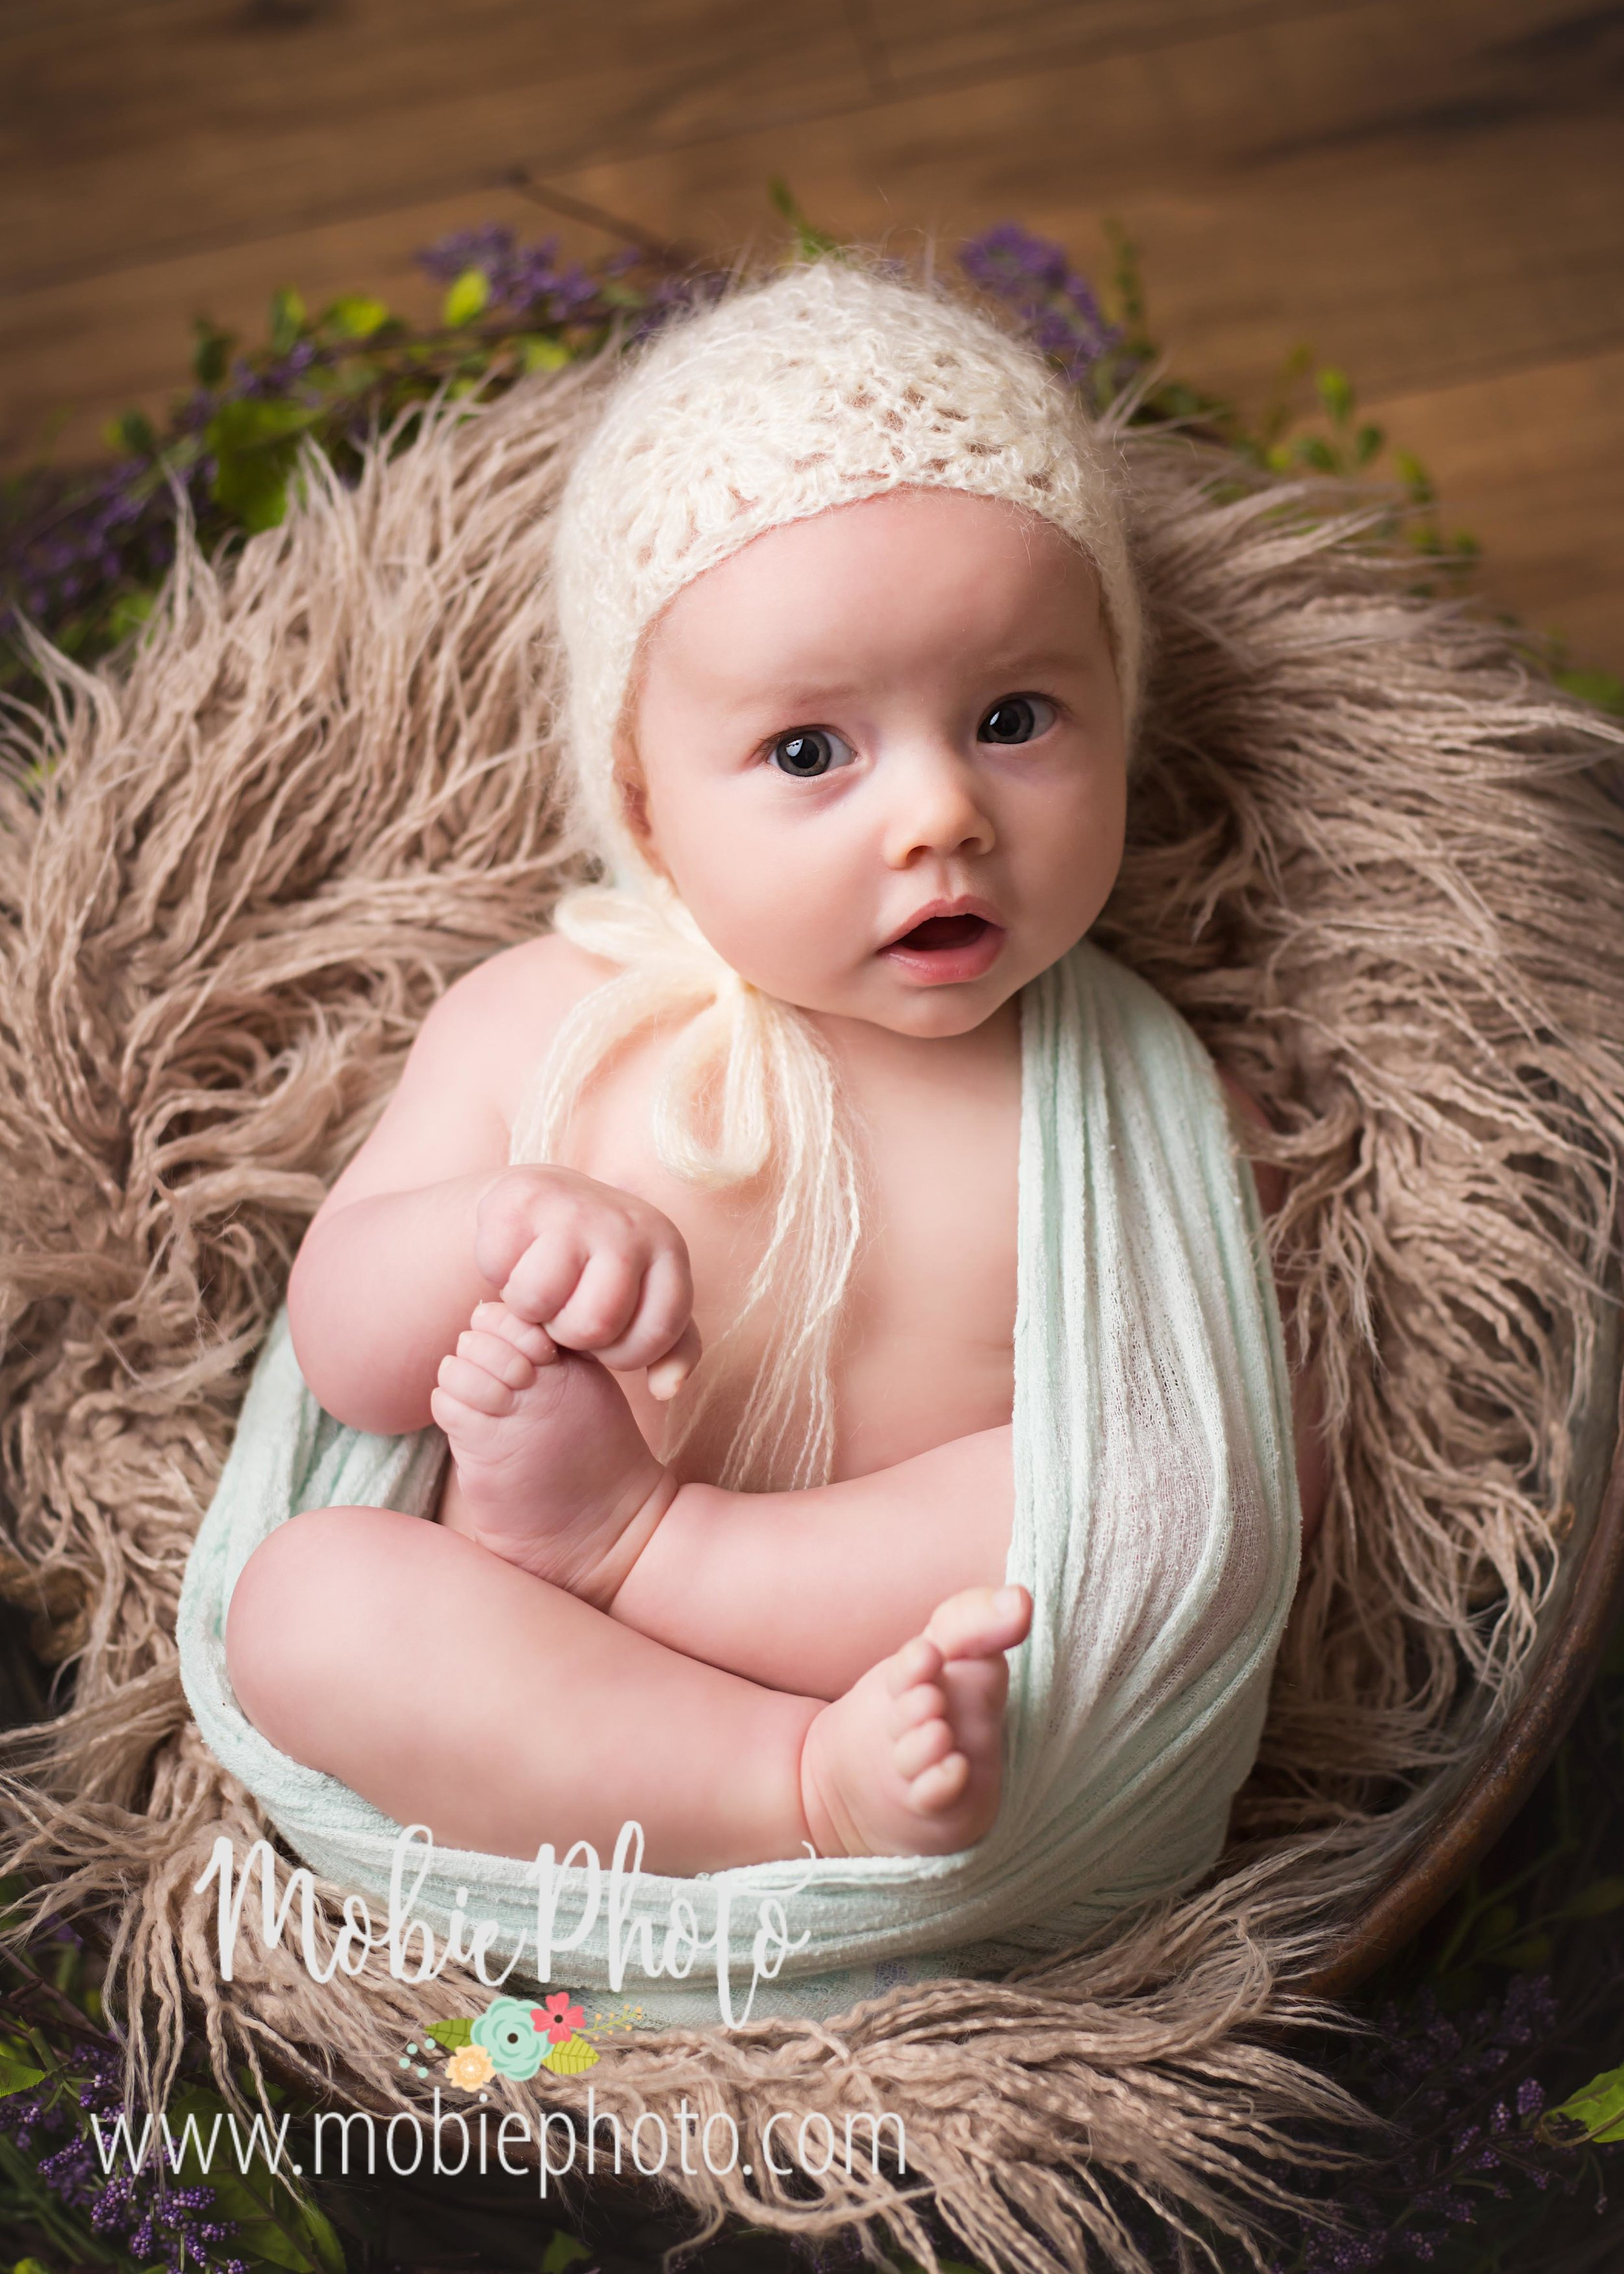 Mobie Photo Utah Newborn Photography - Four Month Milestone Session